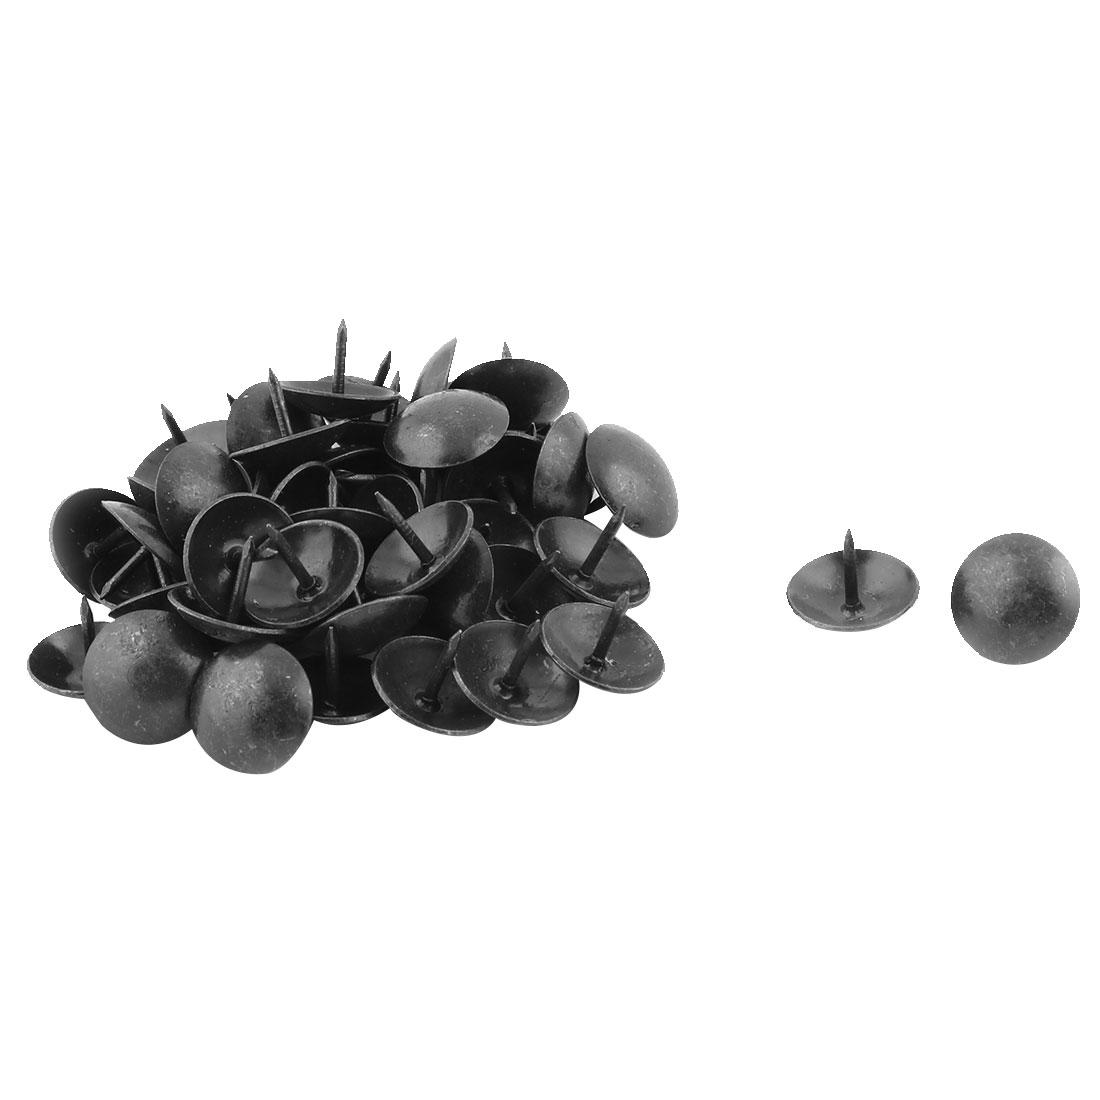 Home Furniture Metal Round Cap Upholstery Thumb Tack Nail Pushpin Black 16 x 13mm 50pcs